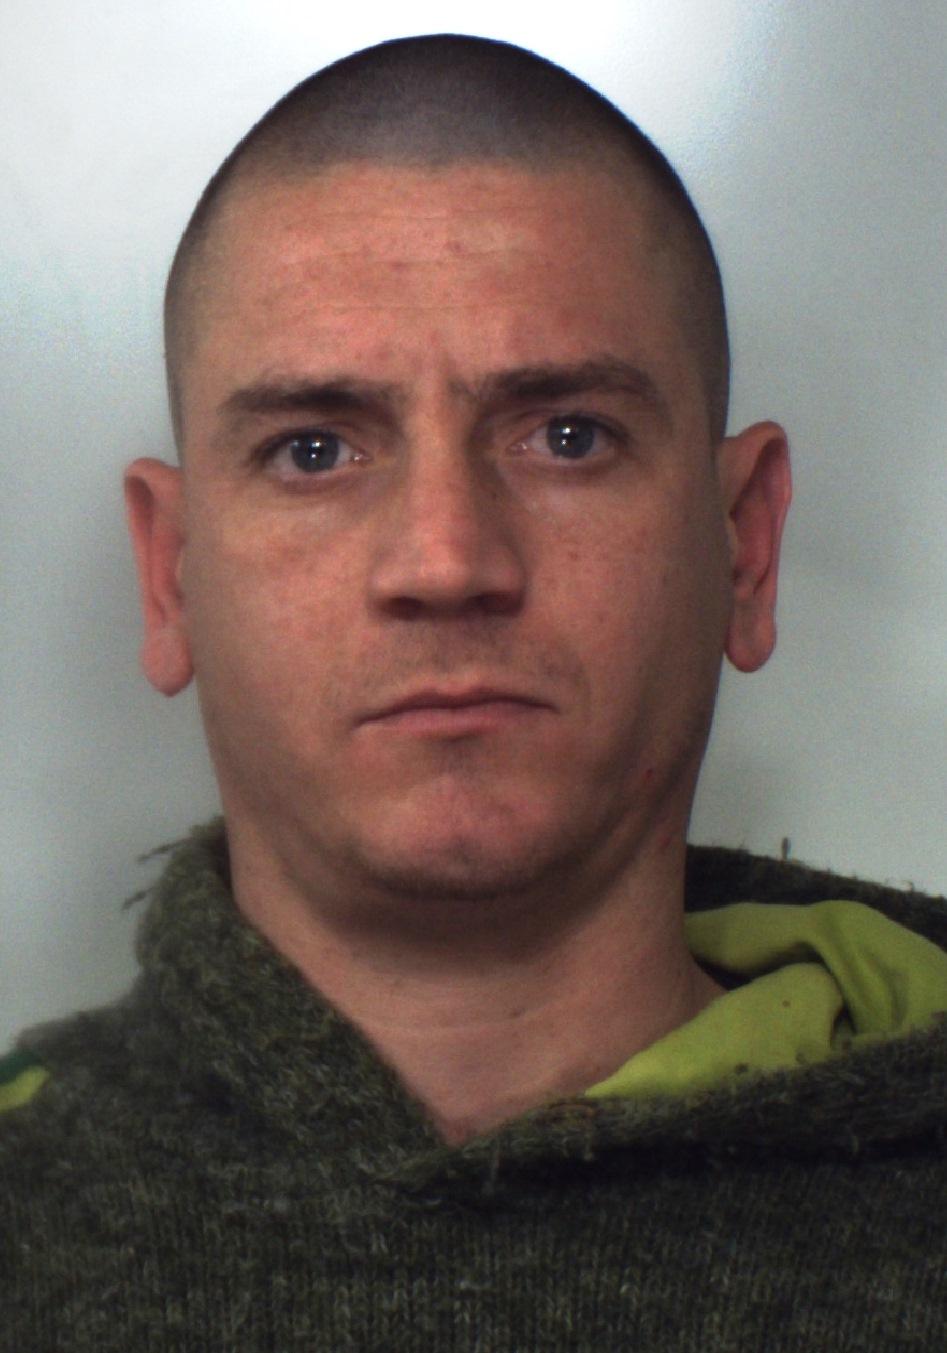 Acireale, aveva in casa 300 grammi di marijuana e una pianta: arrestato